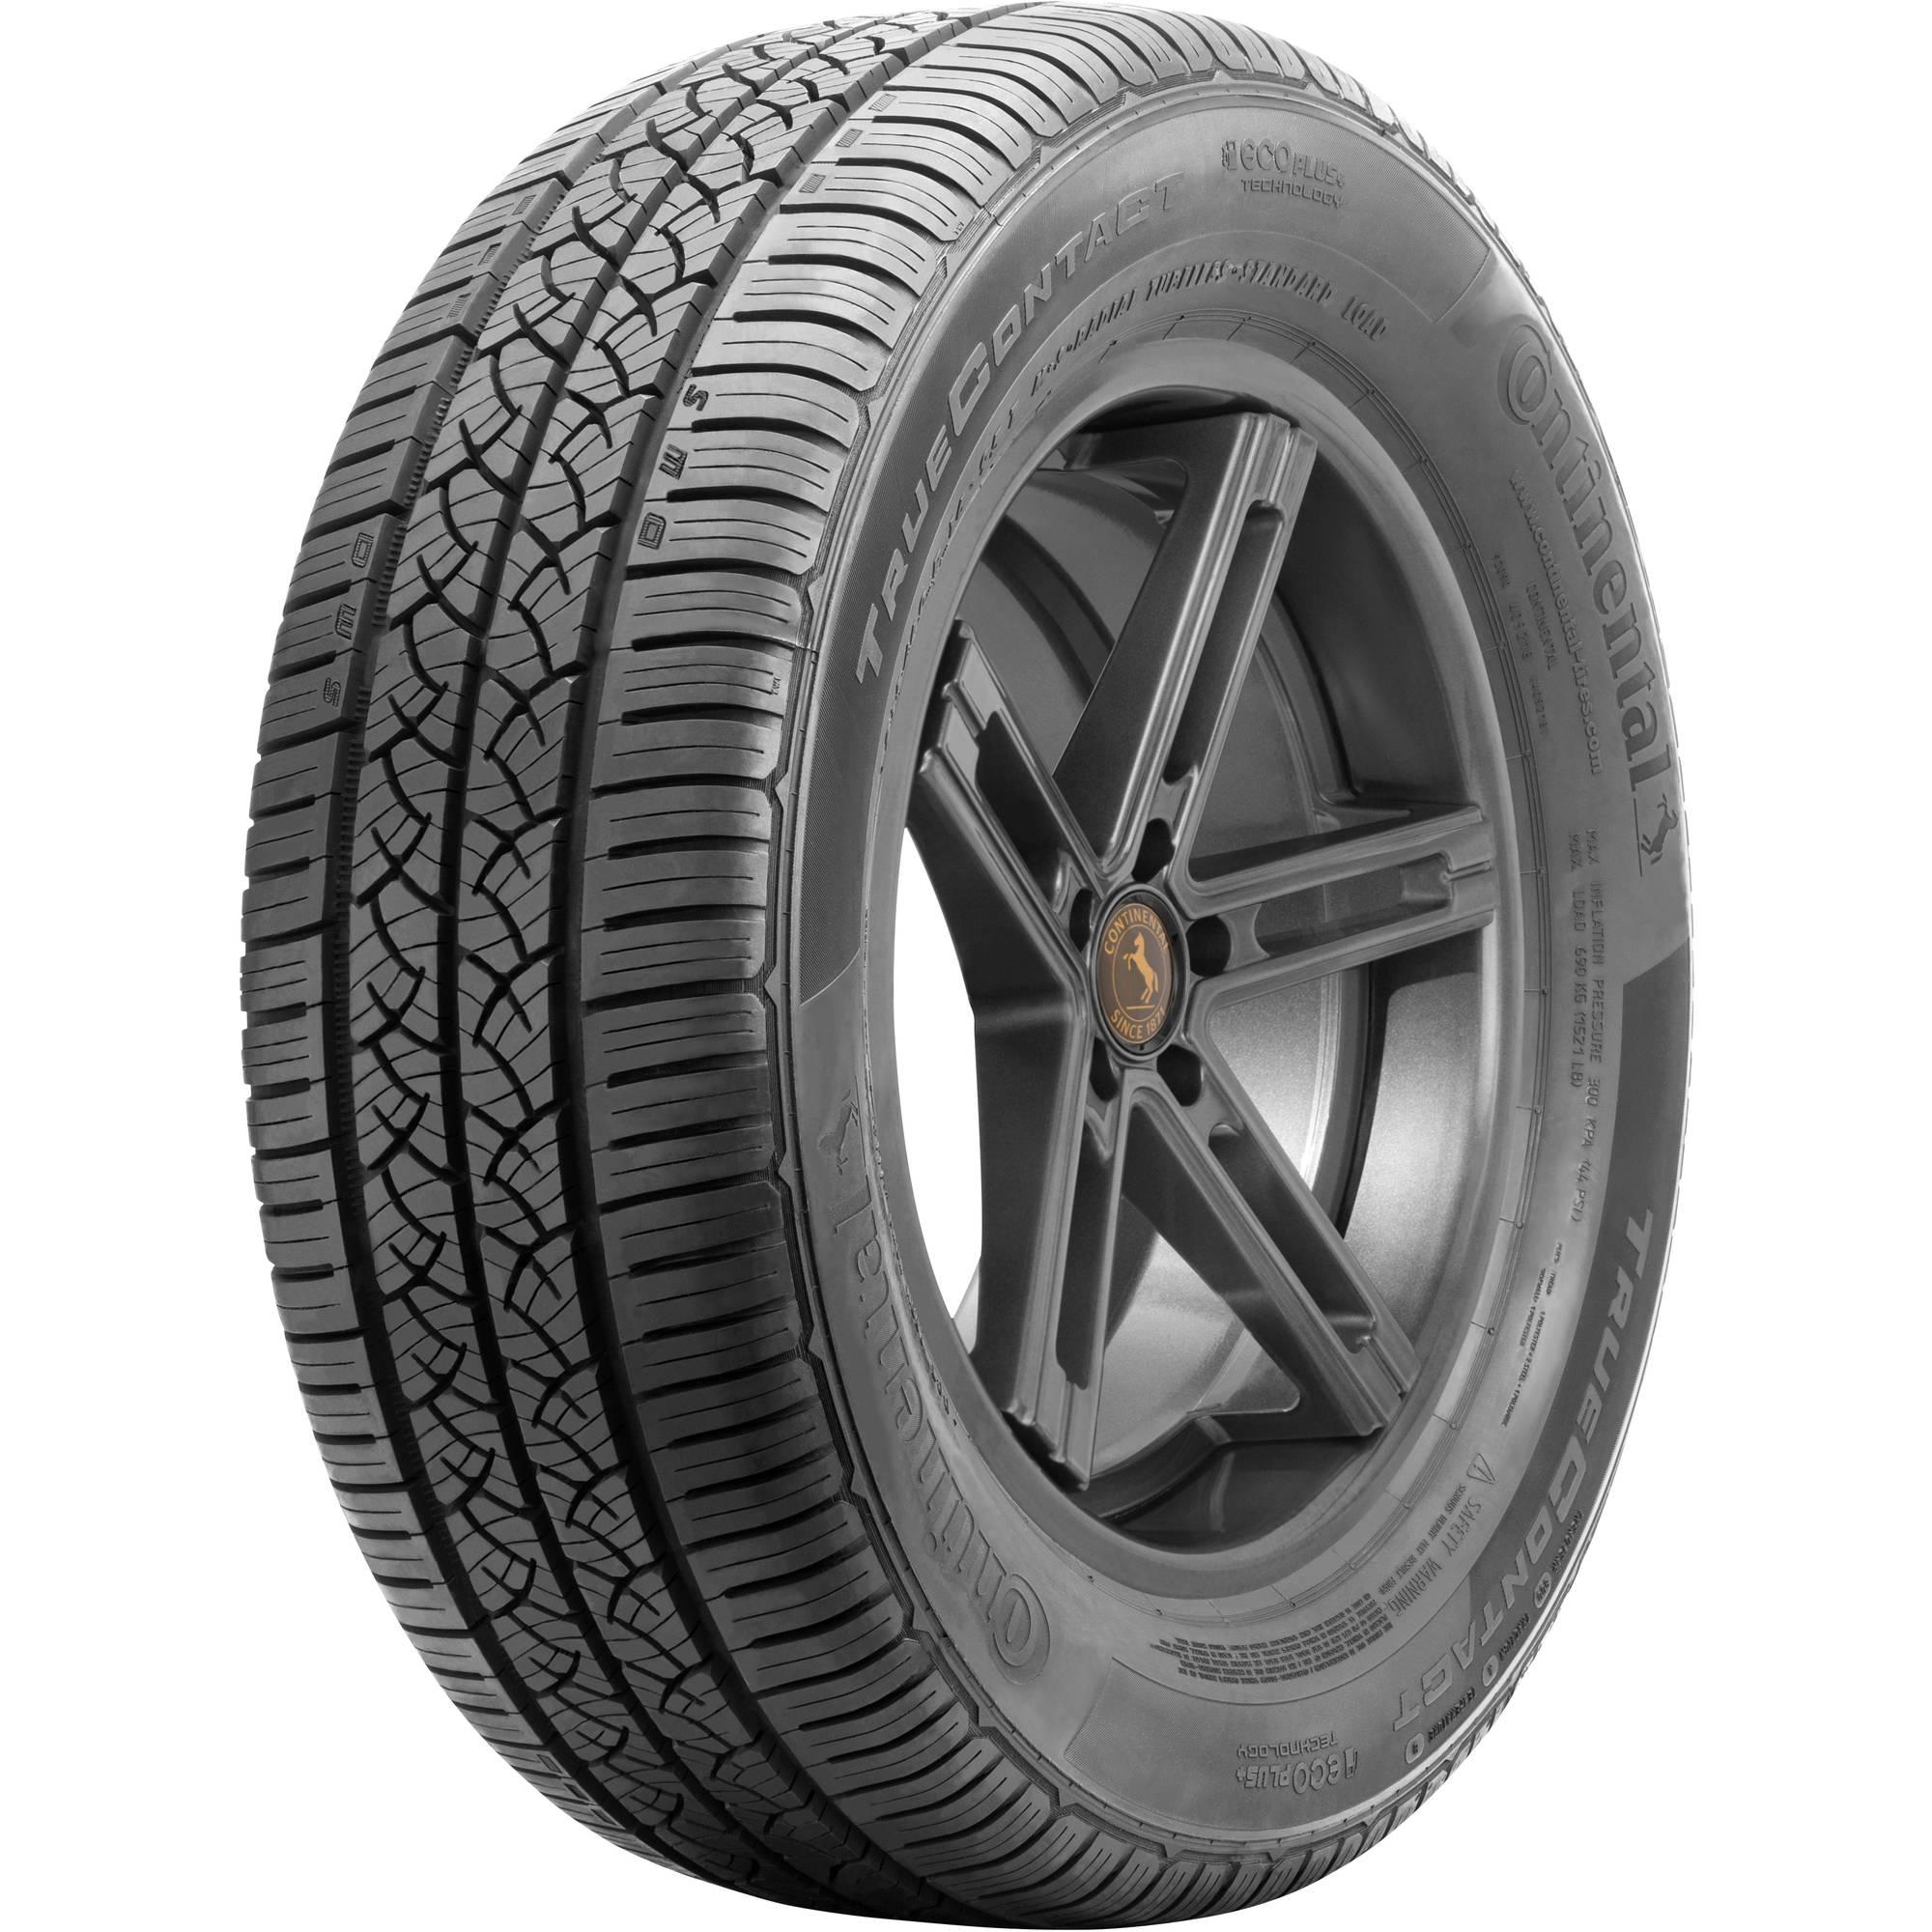 Continental Truecontact Tire 215/45R17 Tire 87V